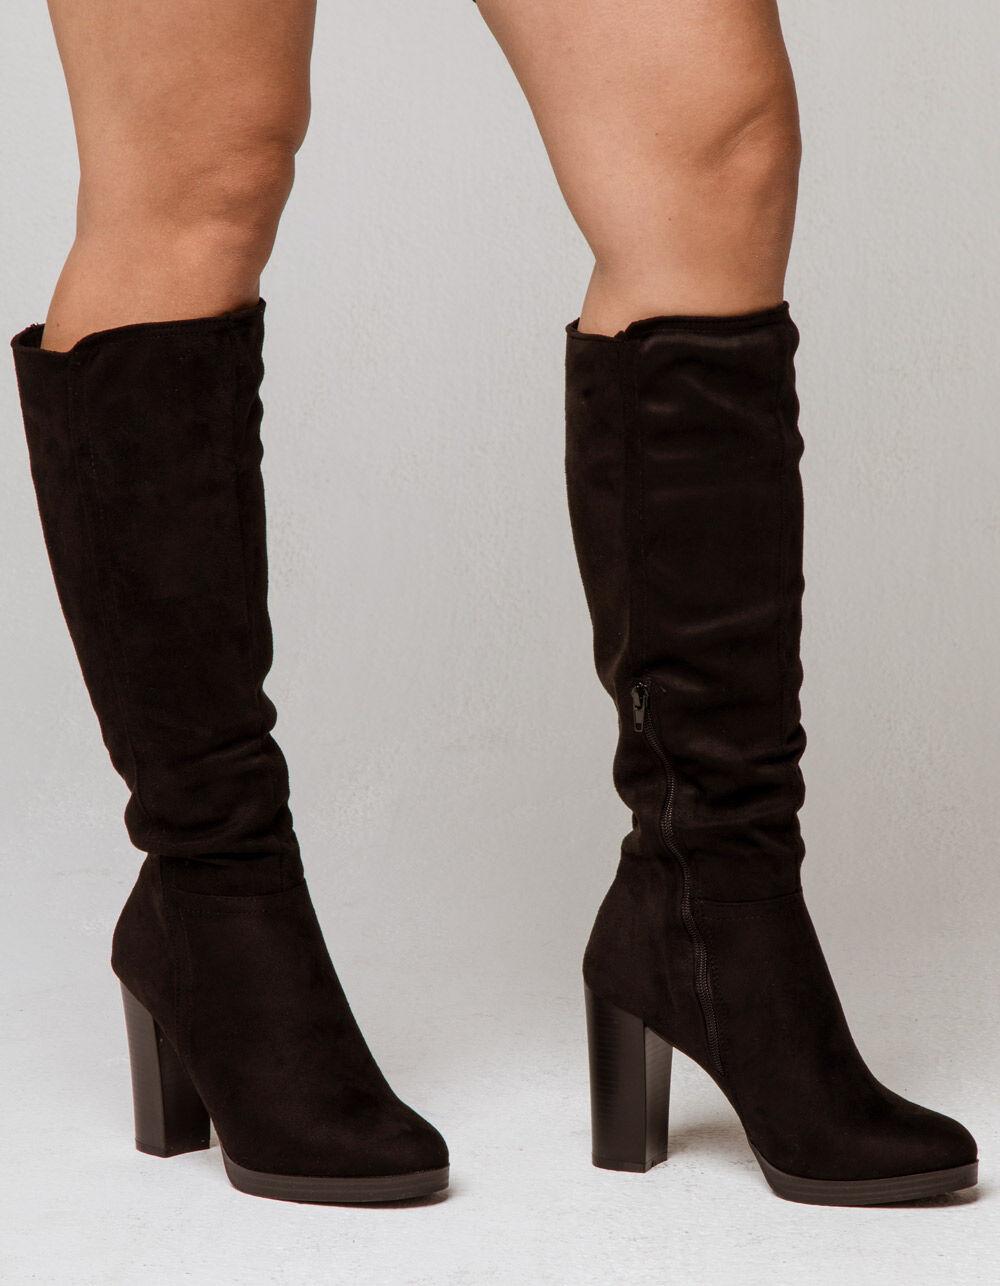 WILD DIVA Knee High Heeled Boots